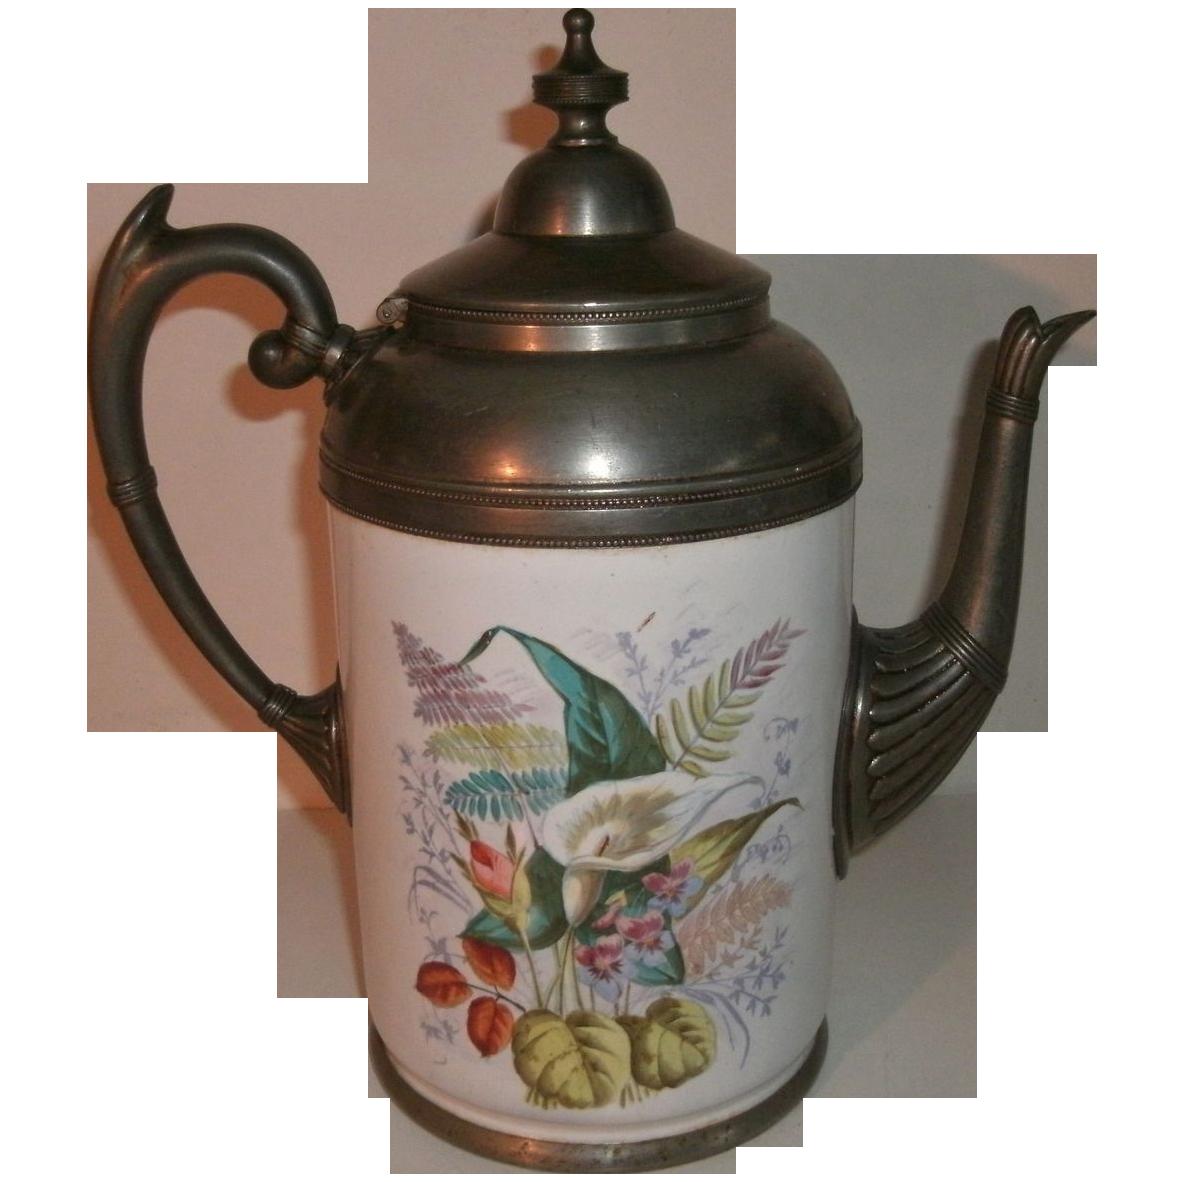 Beautiful 19th Century Victorian Graniteware / enamelware & Pewter (Silverplate) Gooseneck Coffee Pot / Tea Pot with Ornate Floral Spray Decoration